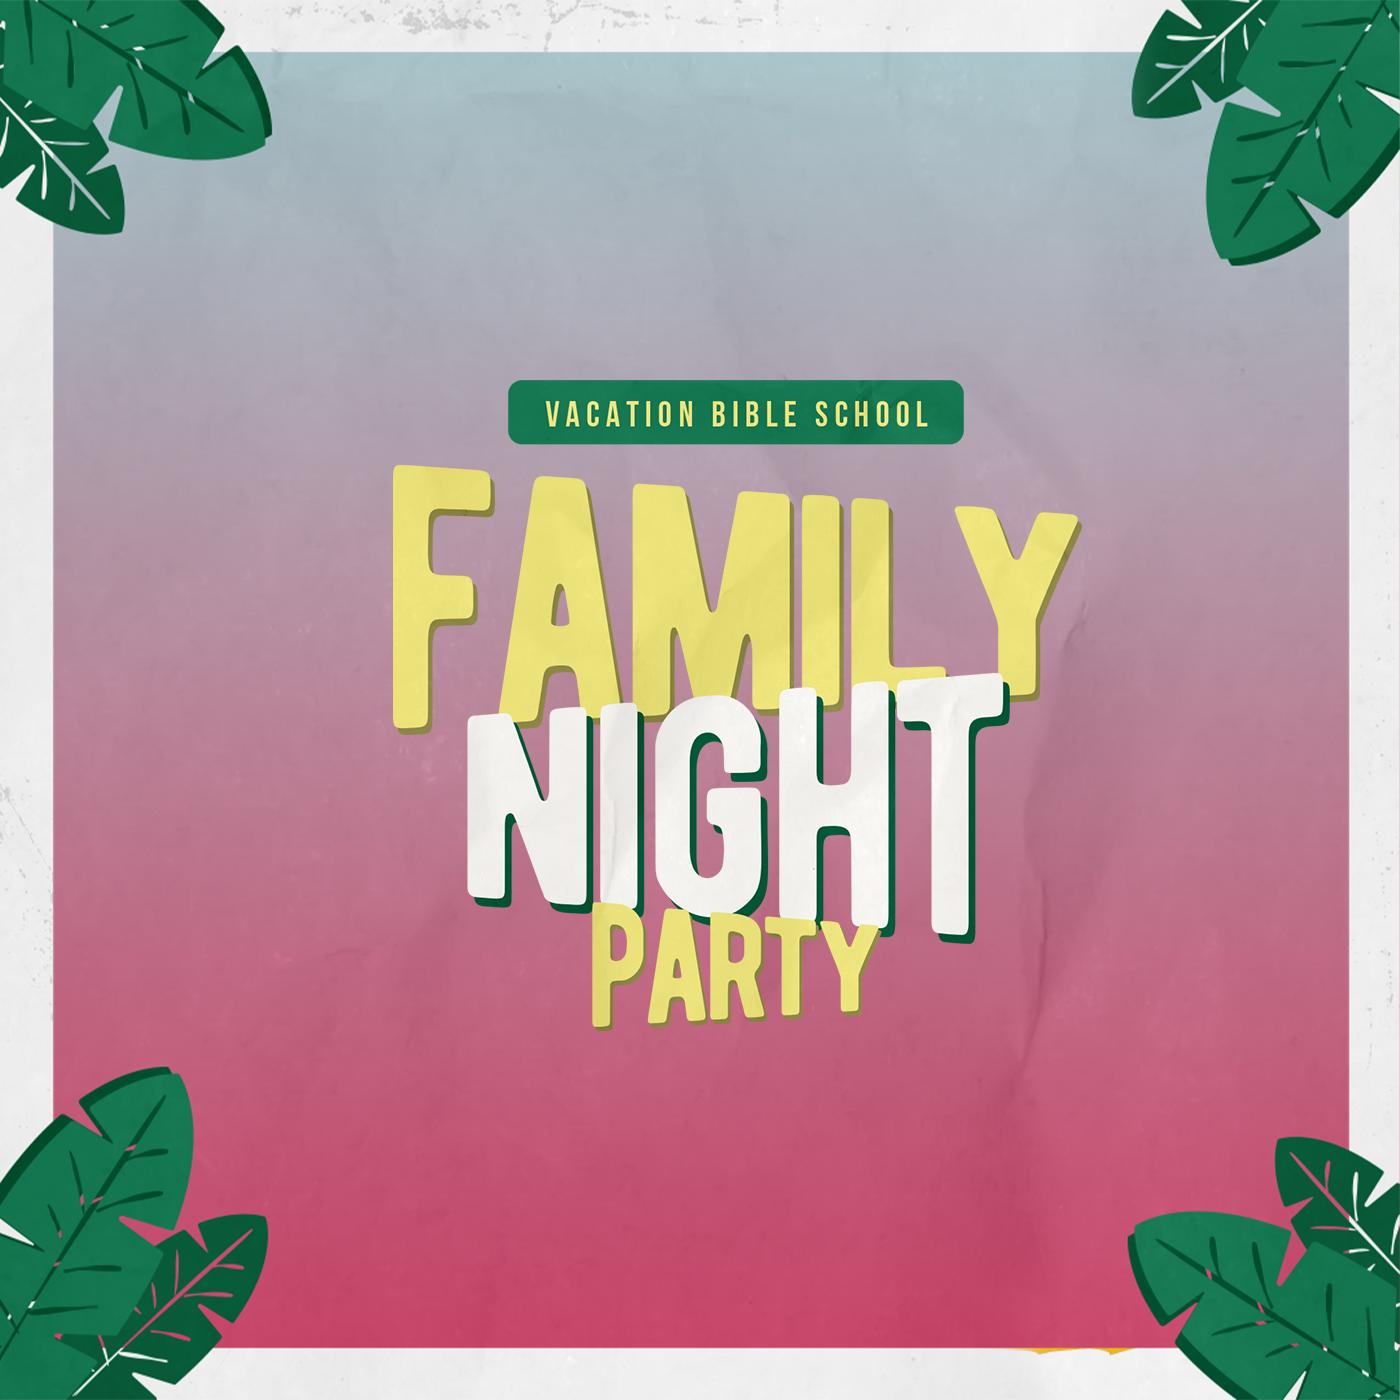 VBS Family Night Square Image.jpg